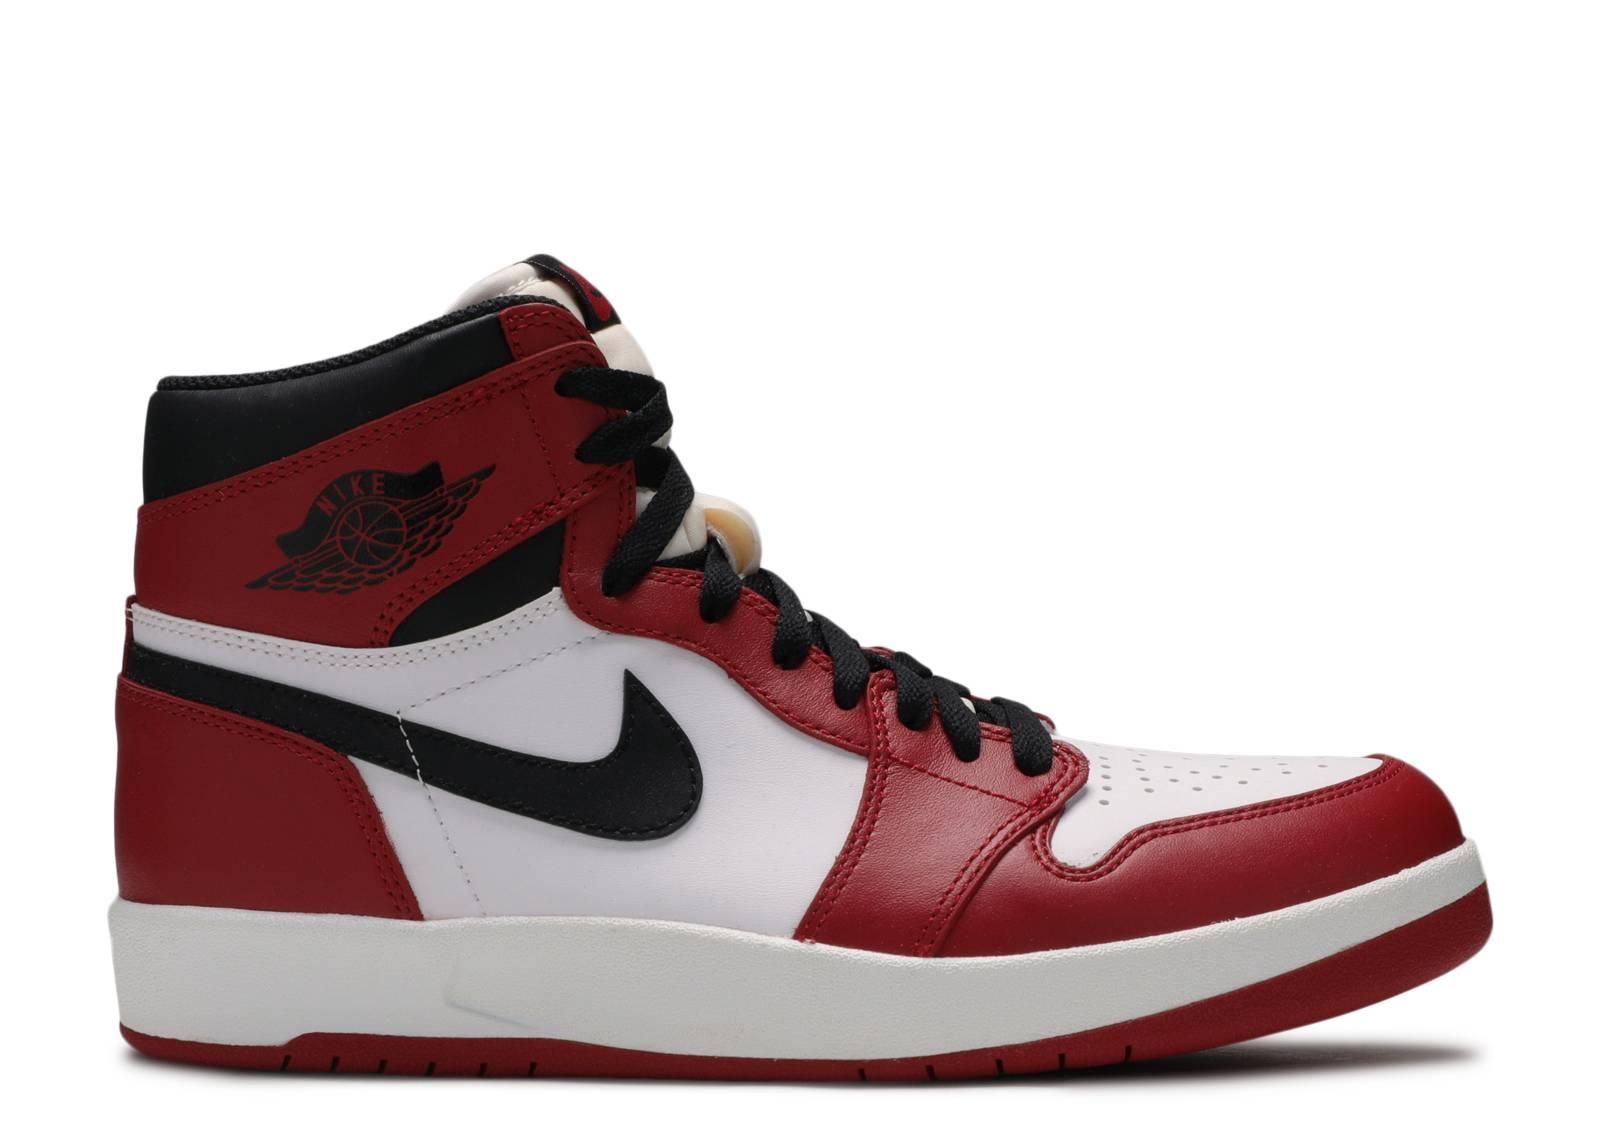 Air Jordan 1.5 'Chicago'